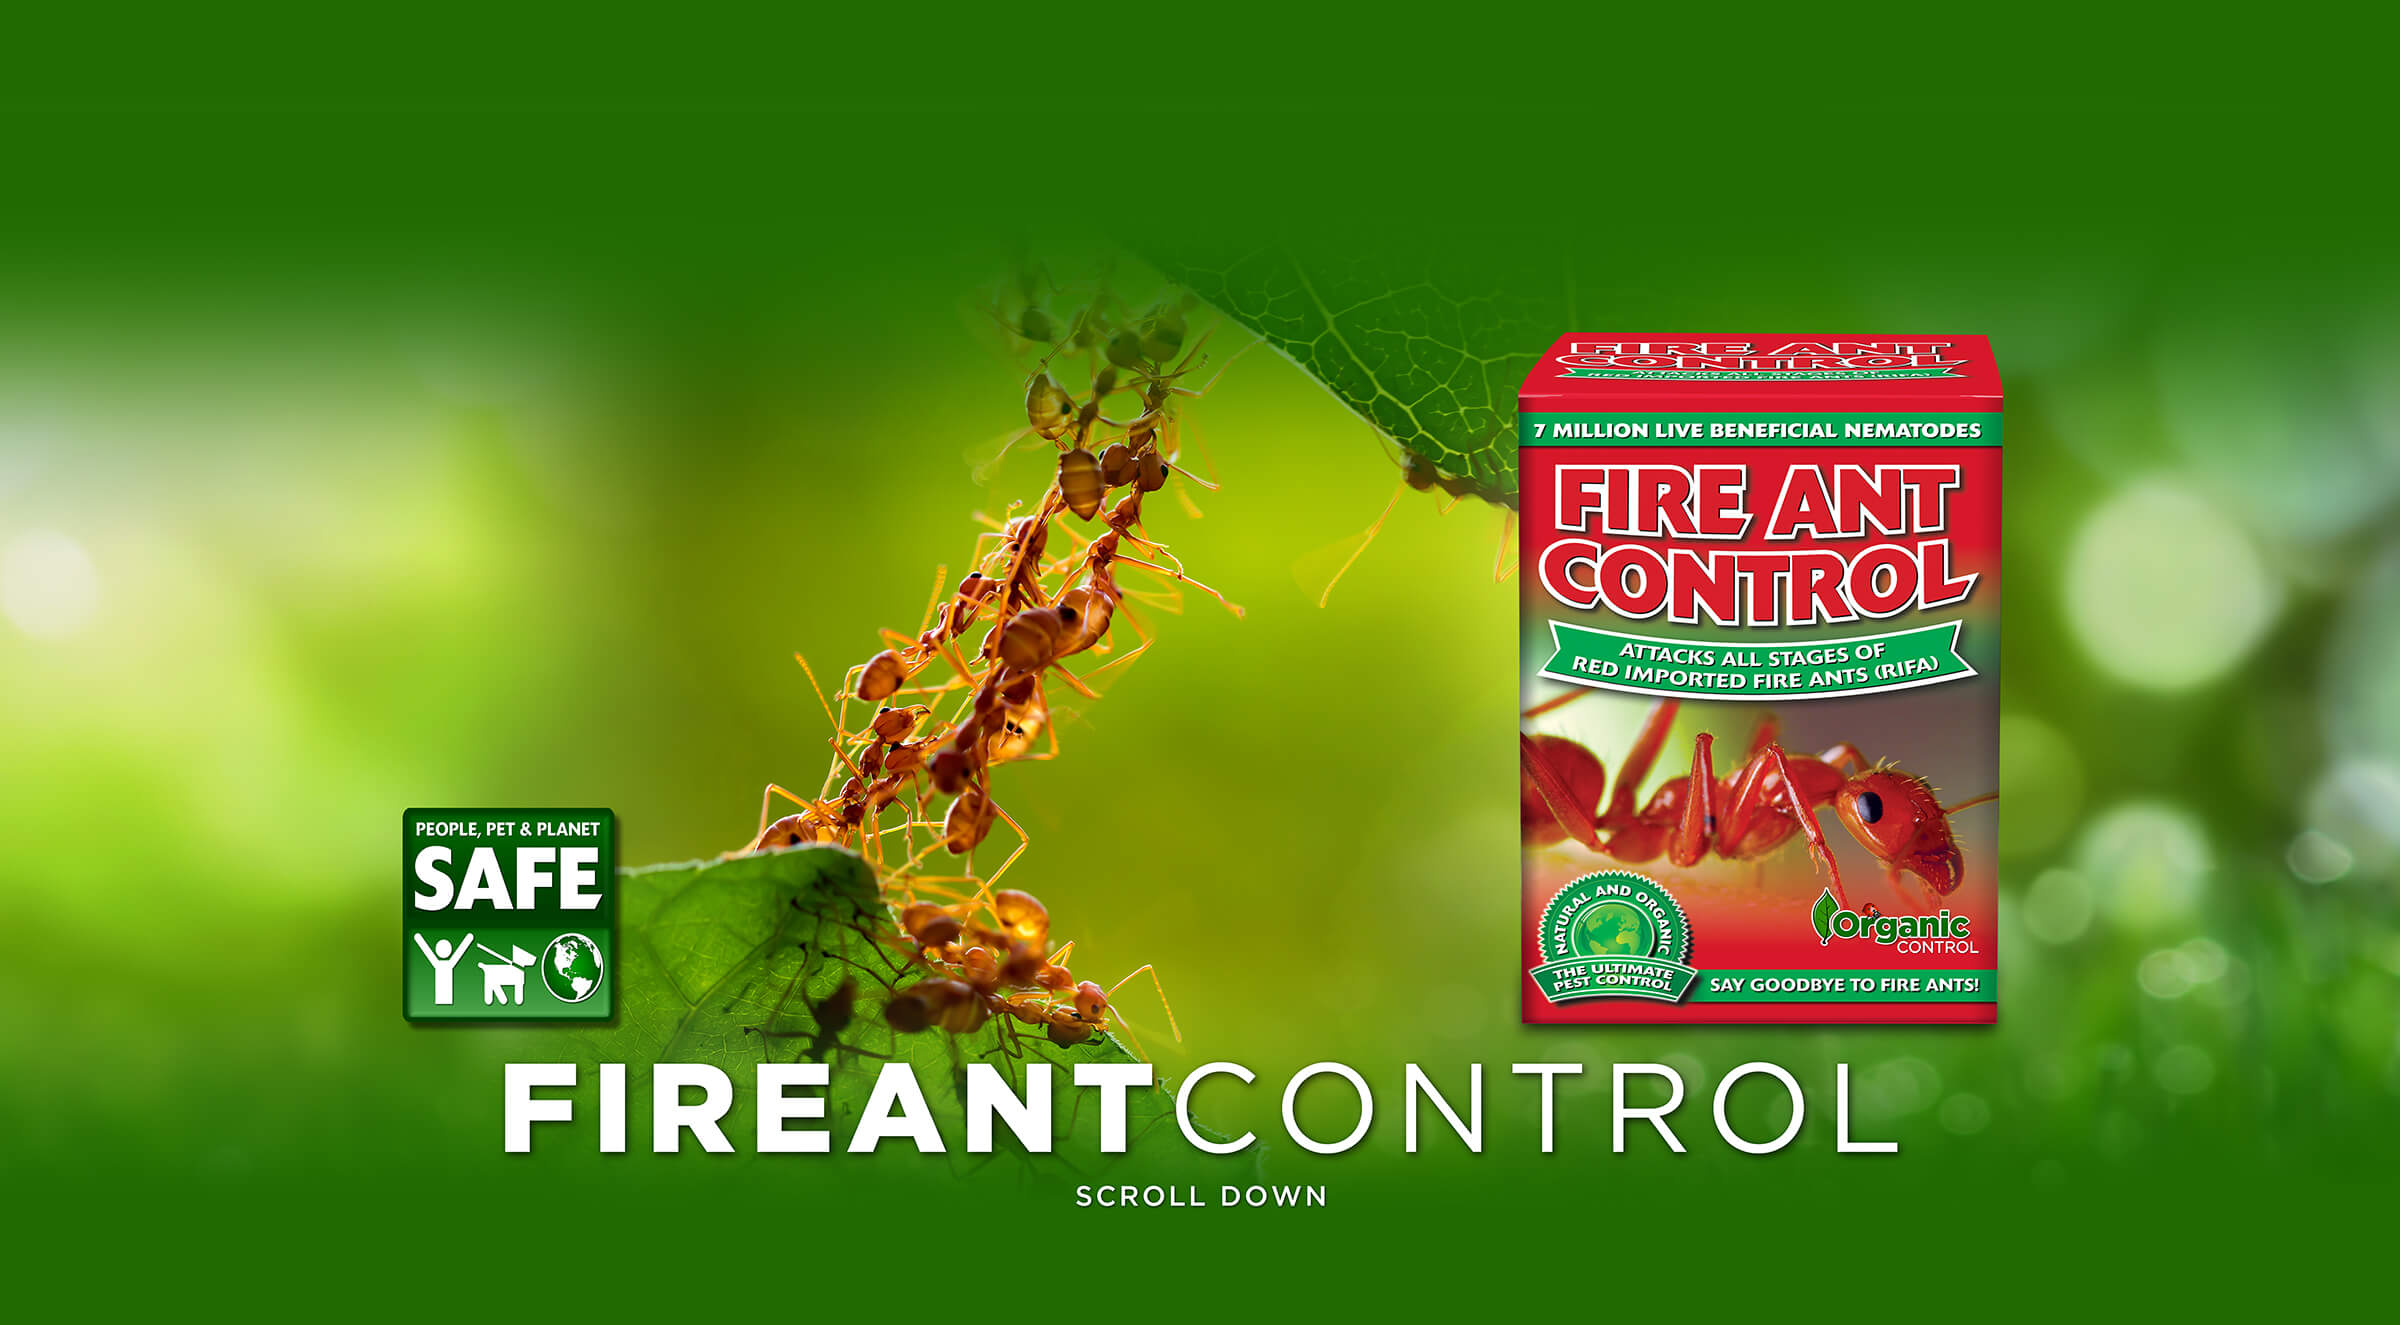 Fire Ant Control Organic Control Inc